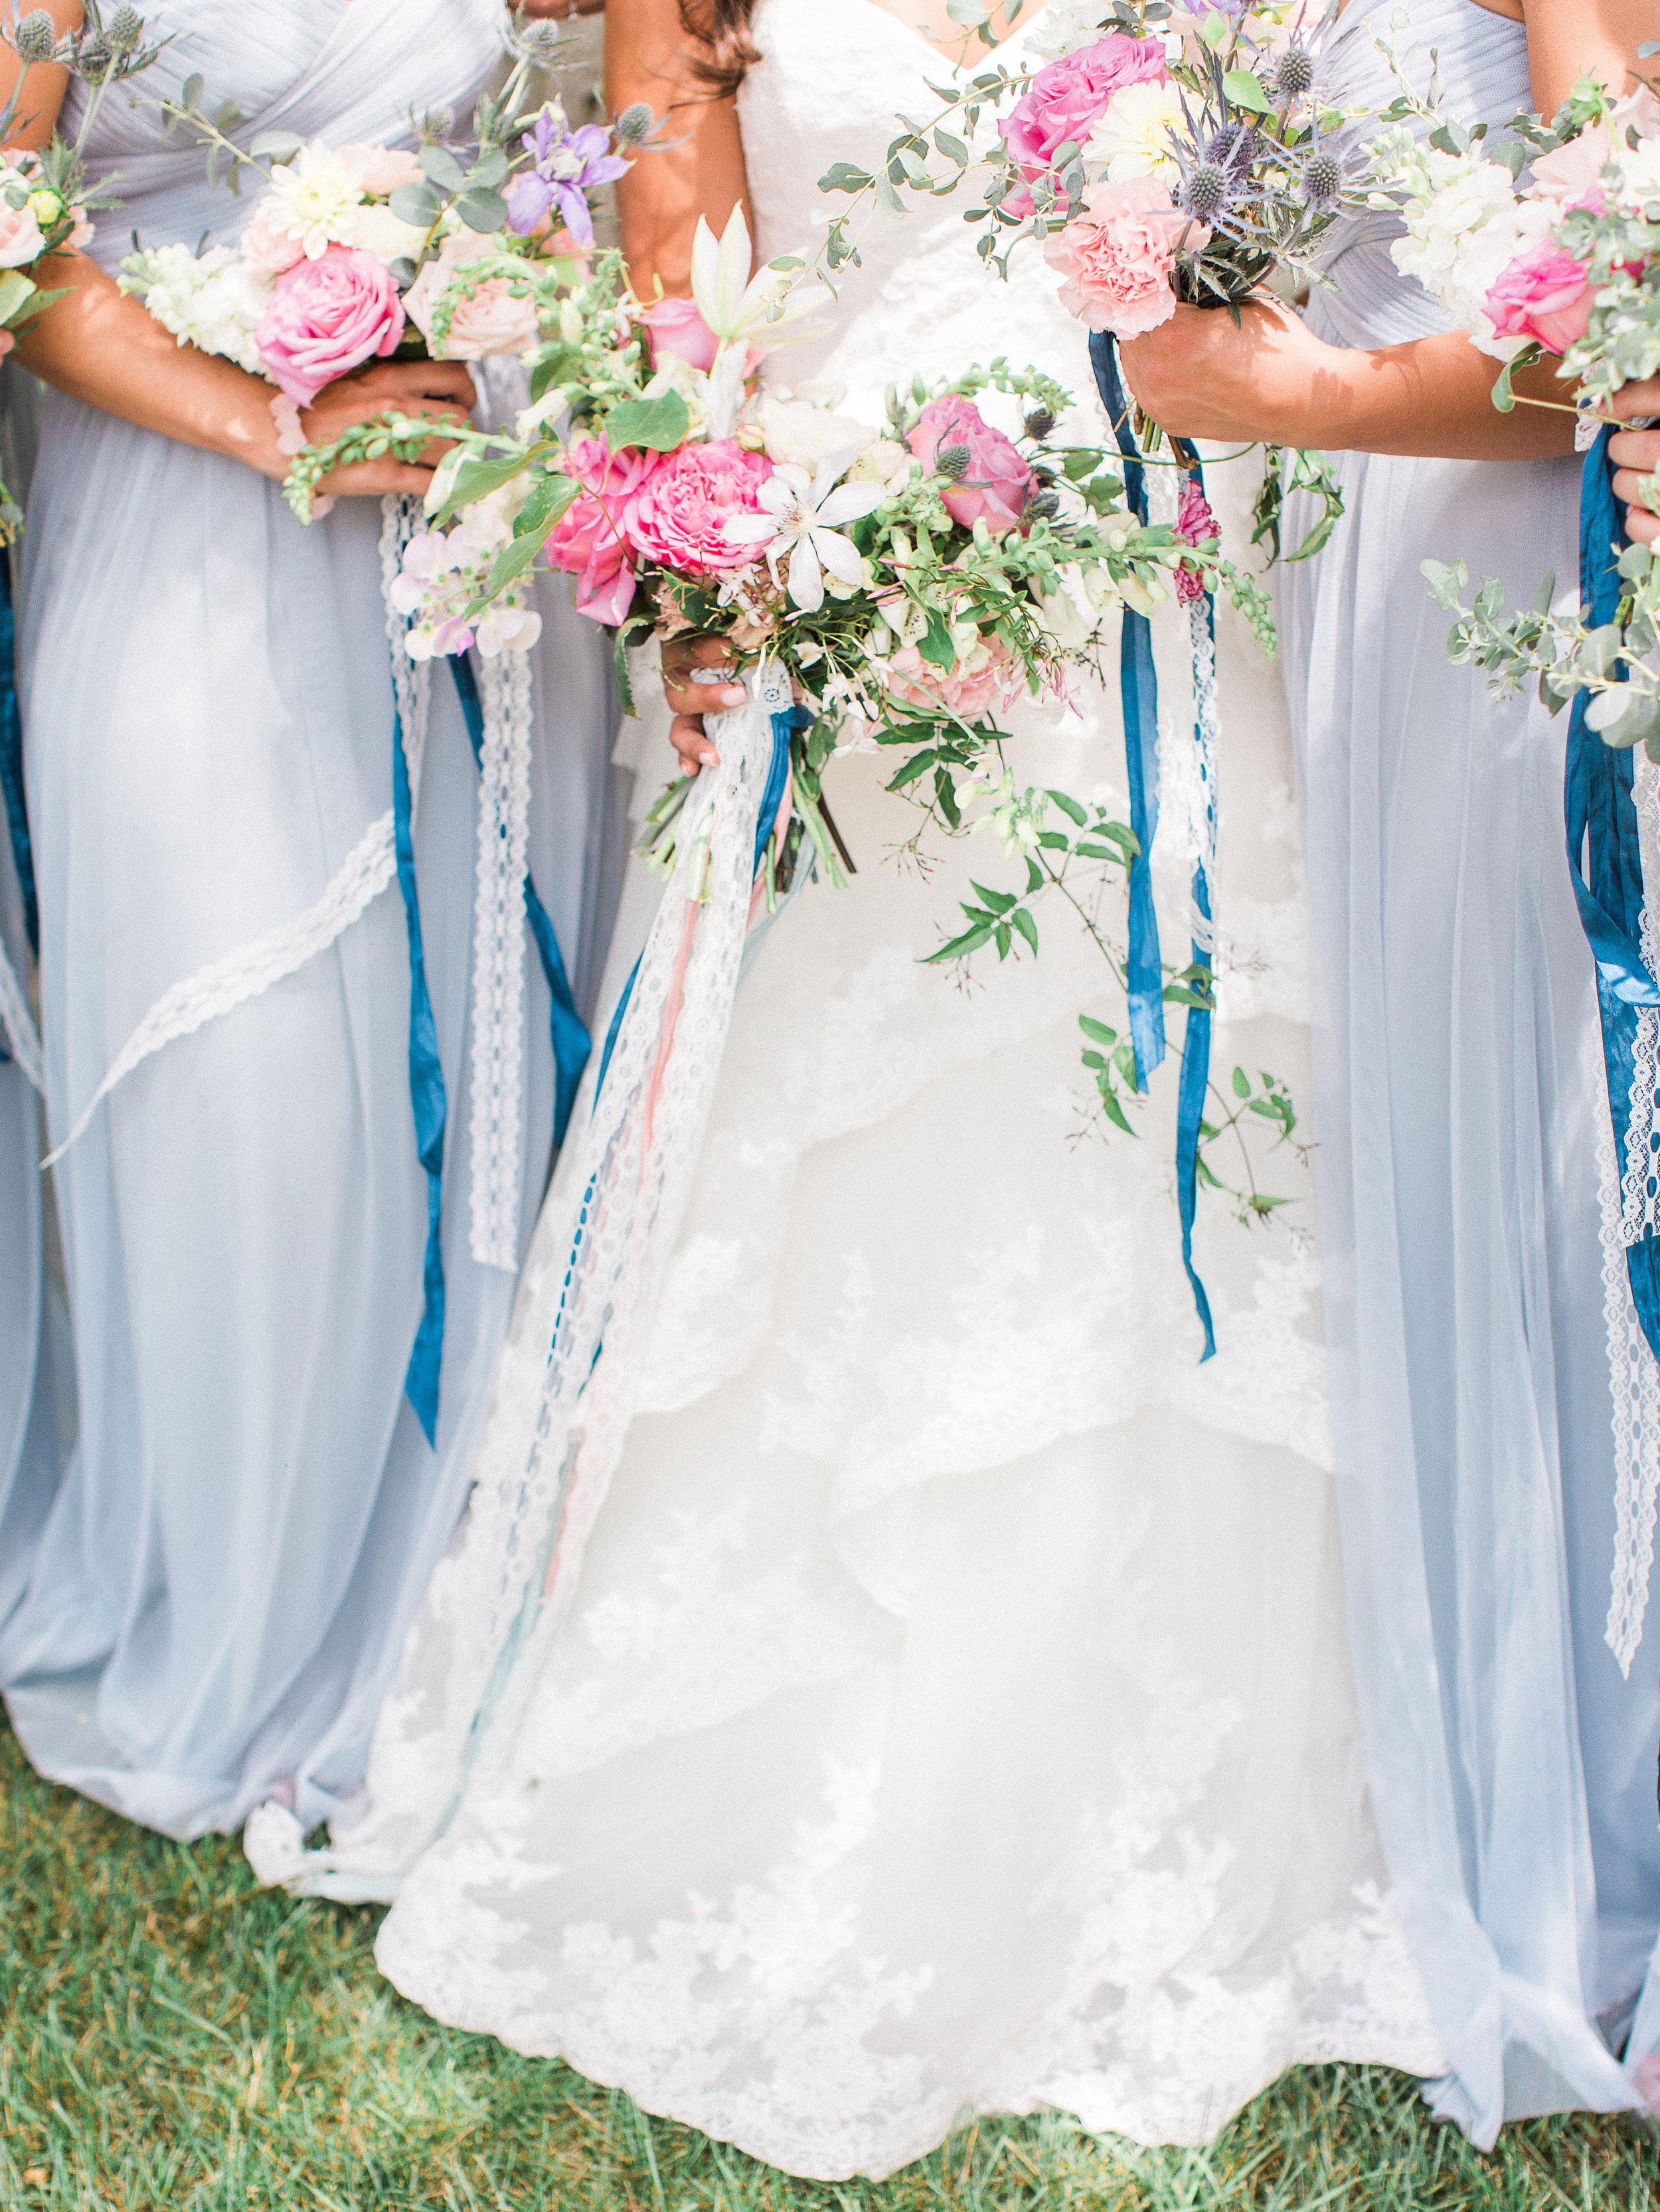 ERIC AND HALLIE WEDDING-HI RESOLUTION FOR PRINTING-0284.jpg